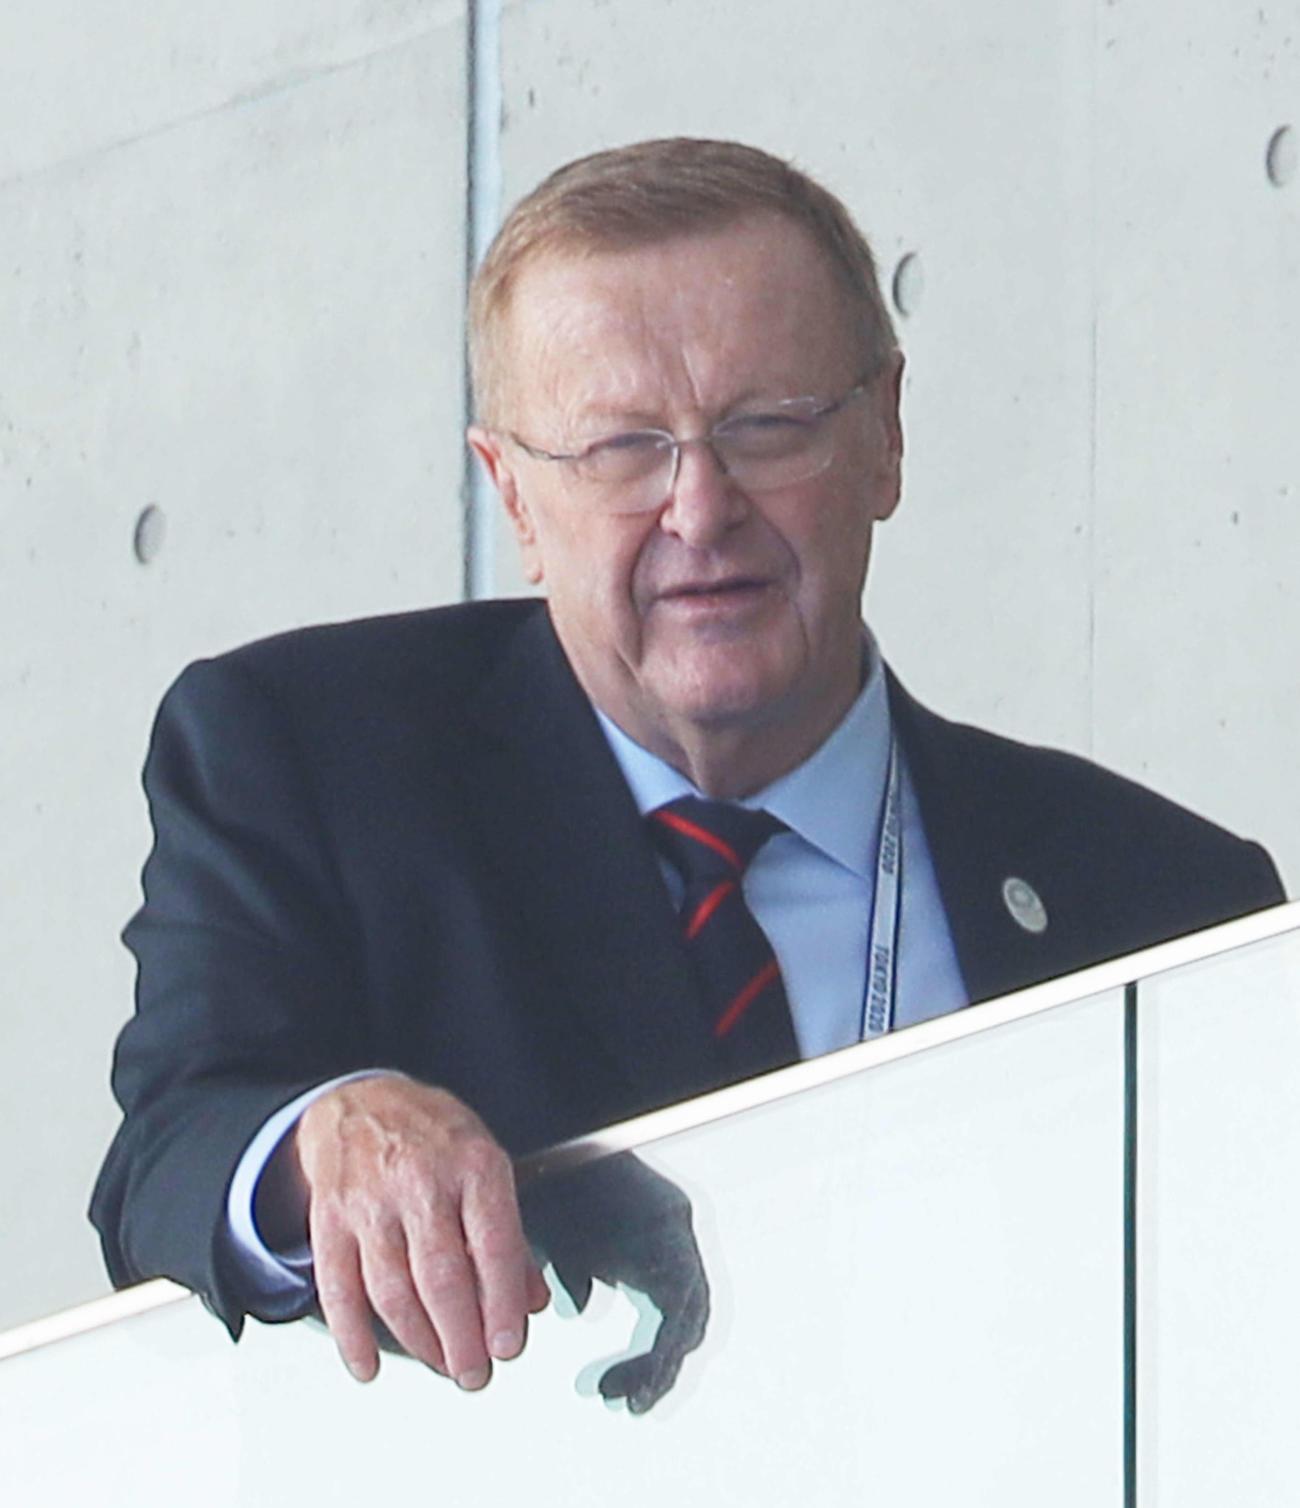 IOC調査委員会のジョン・コーツ委員長(2019年10月30日撮影)